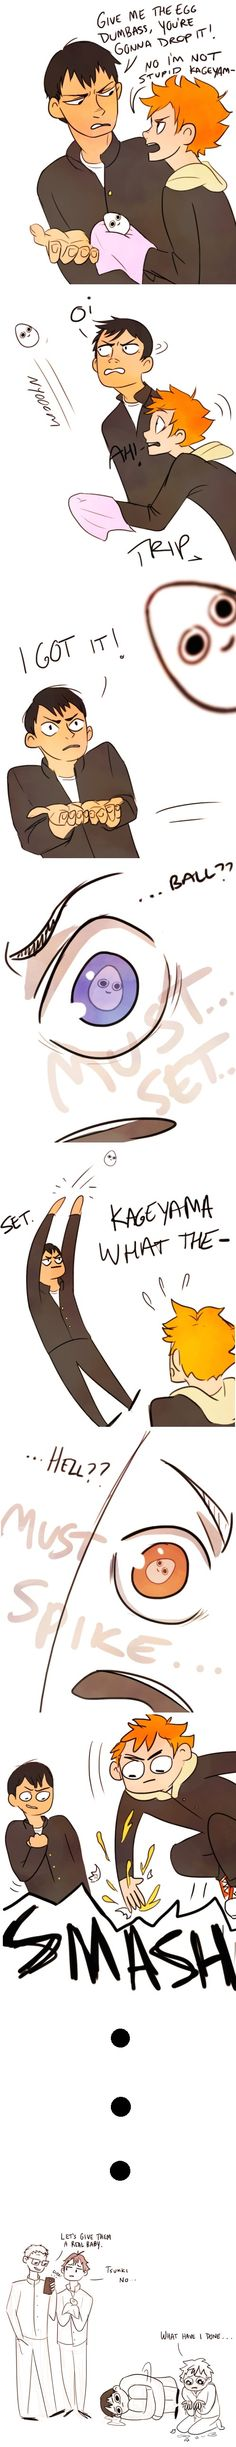 Haikyuu comic funny (Tumblr: Spatziline)